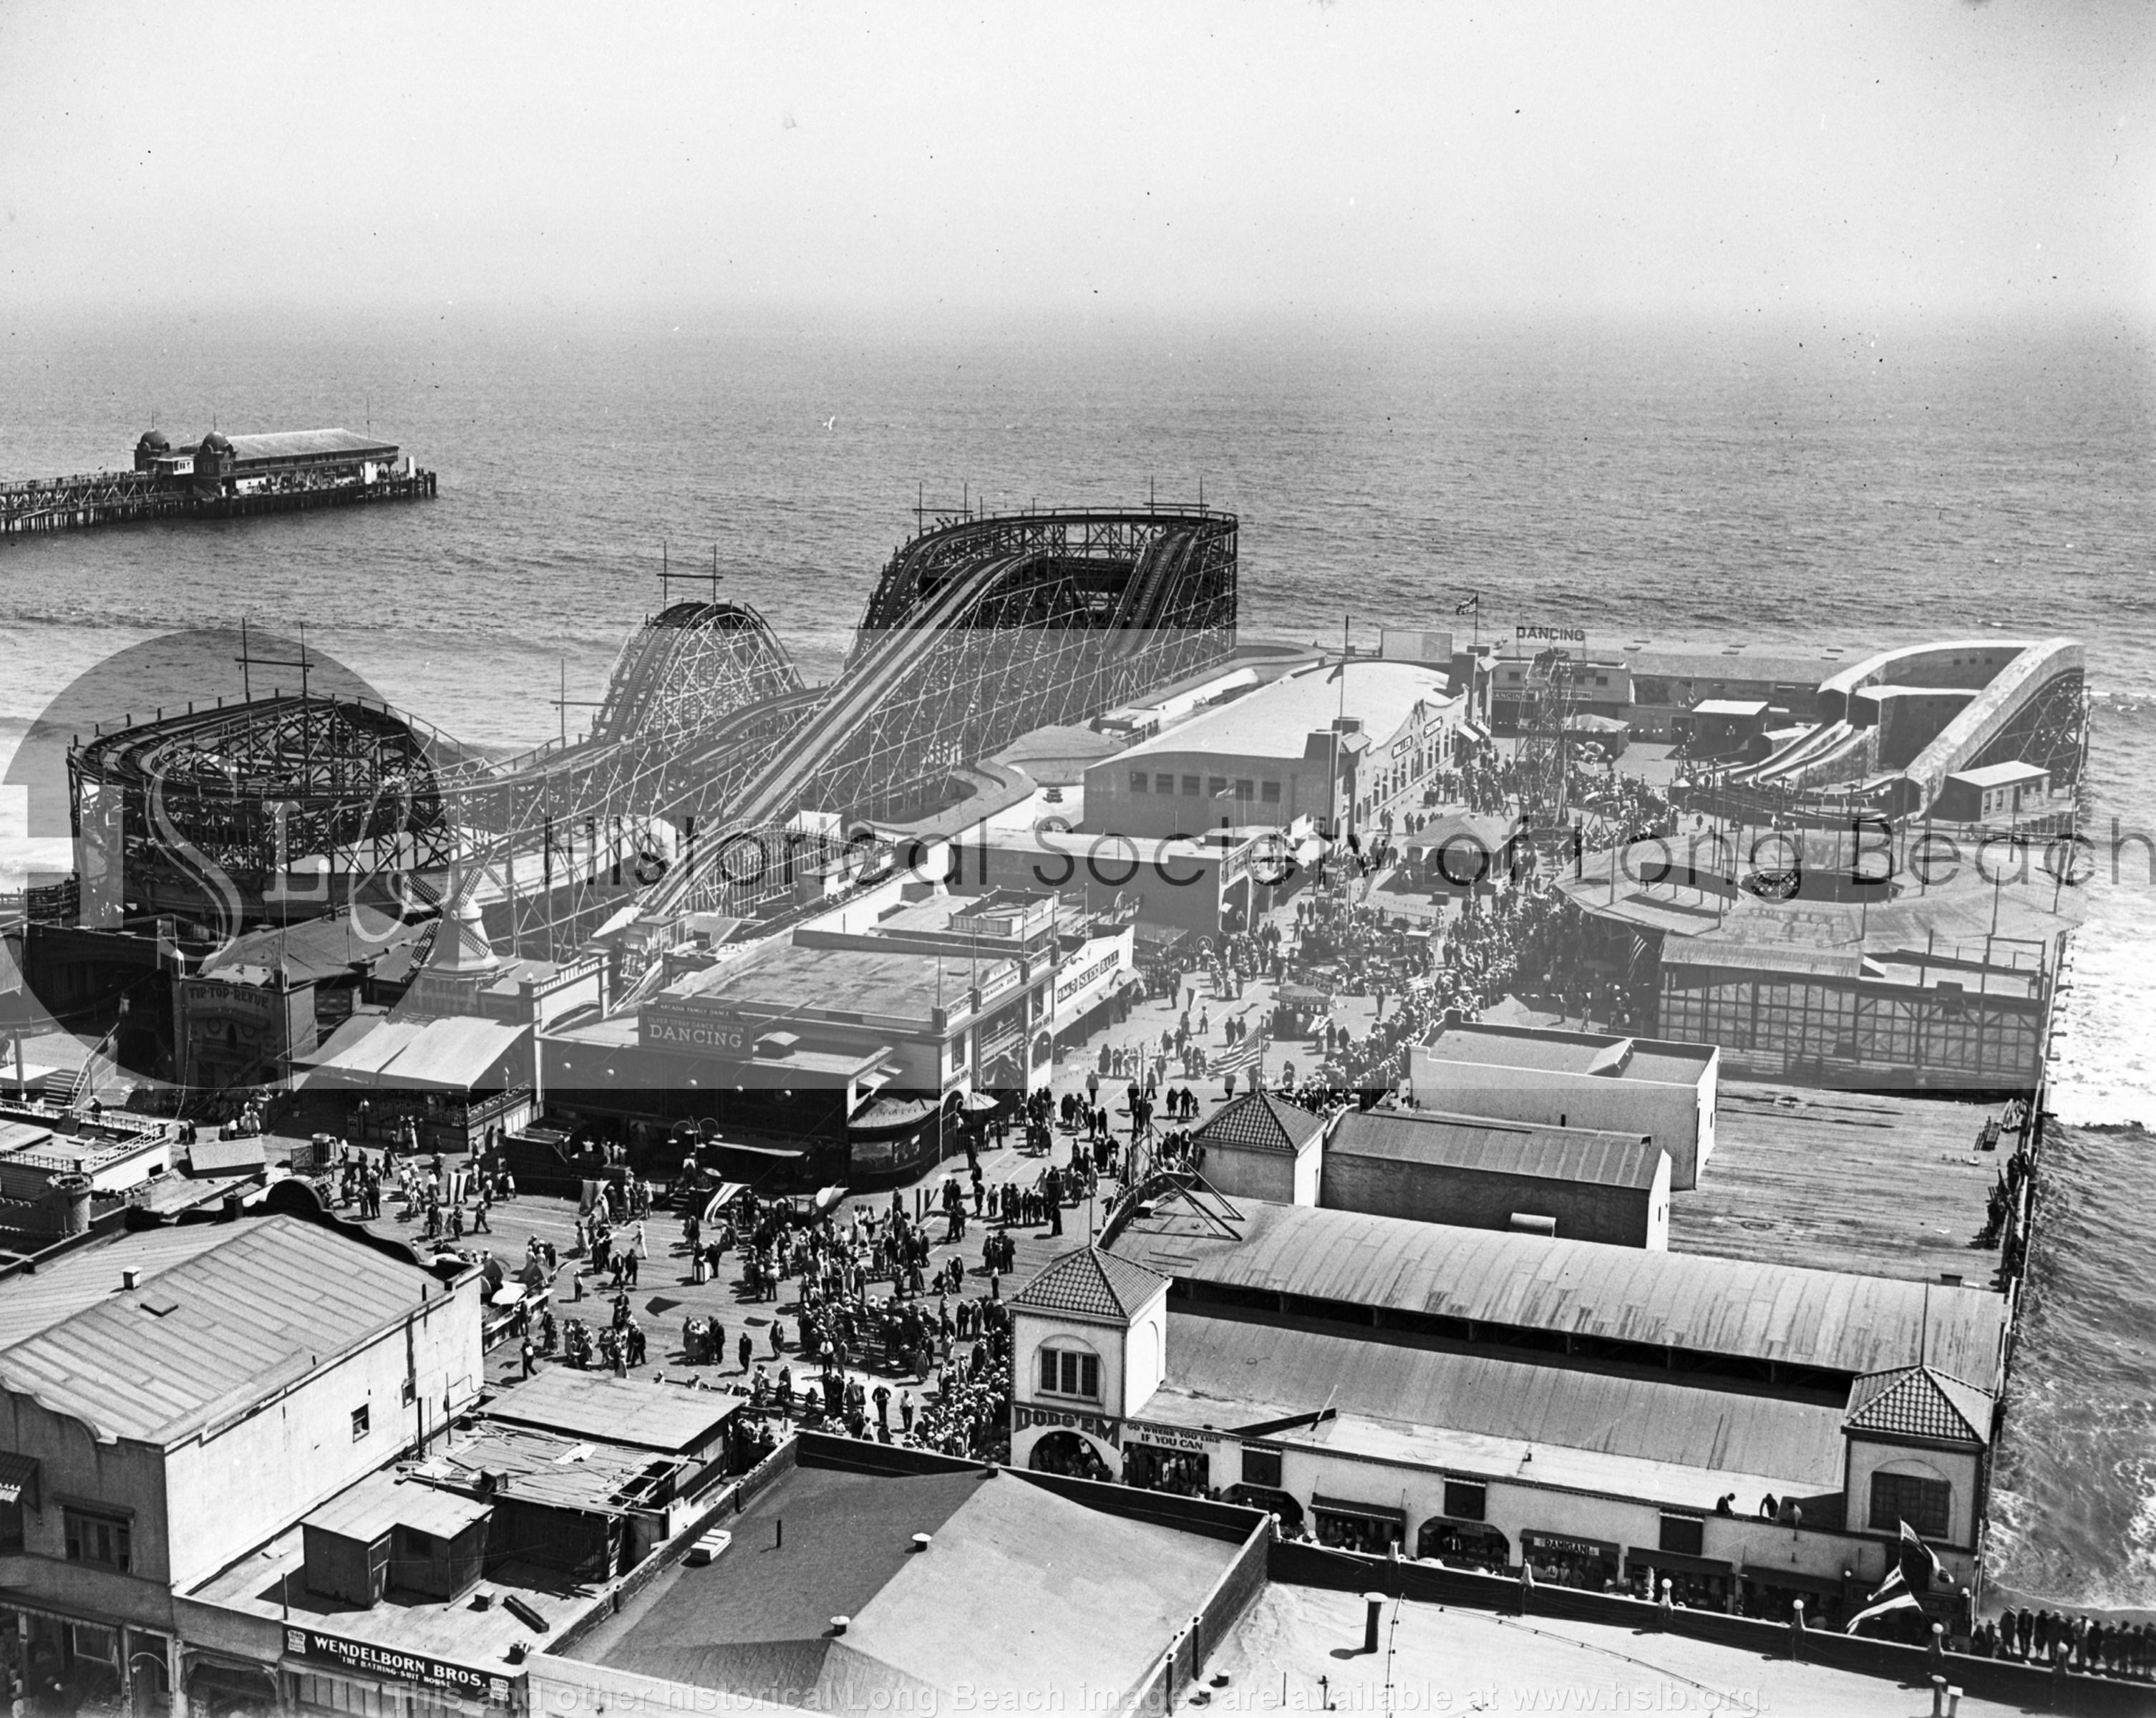 Silver Spray Pier, 1924 vintage photograph